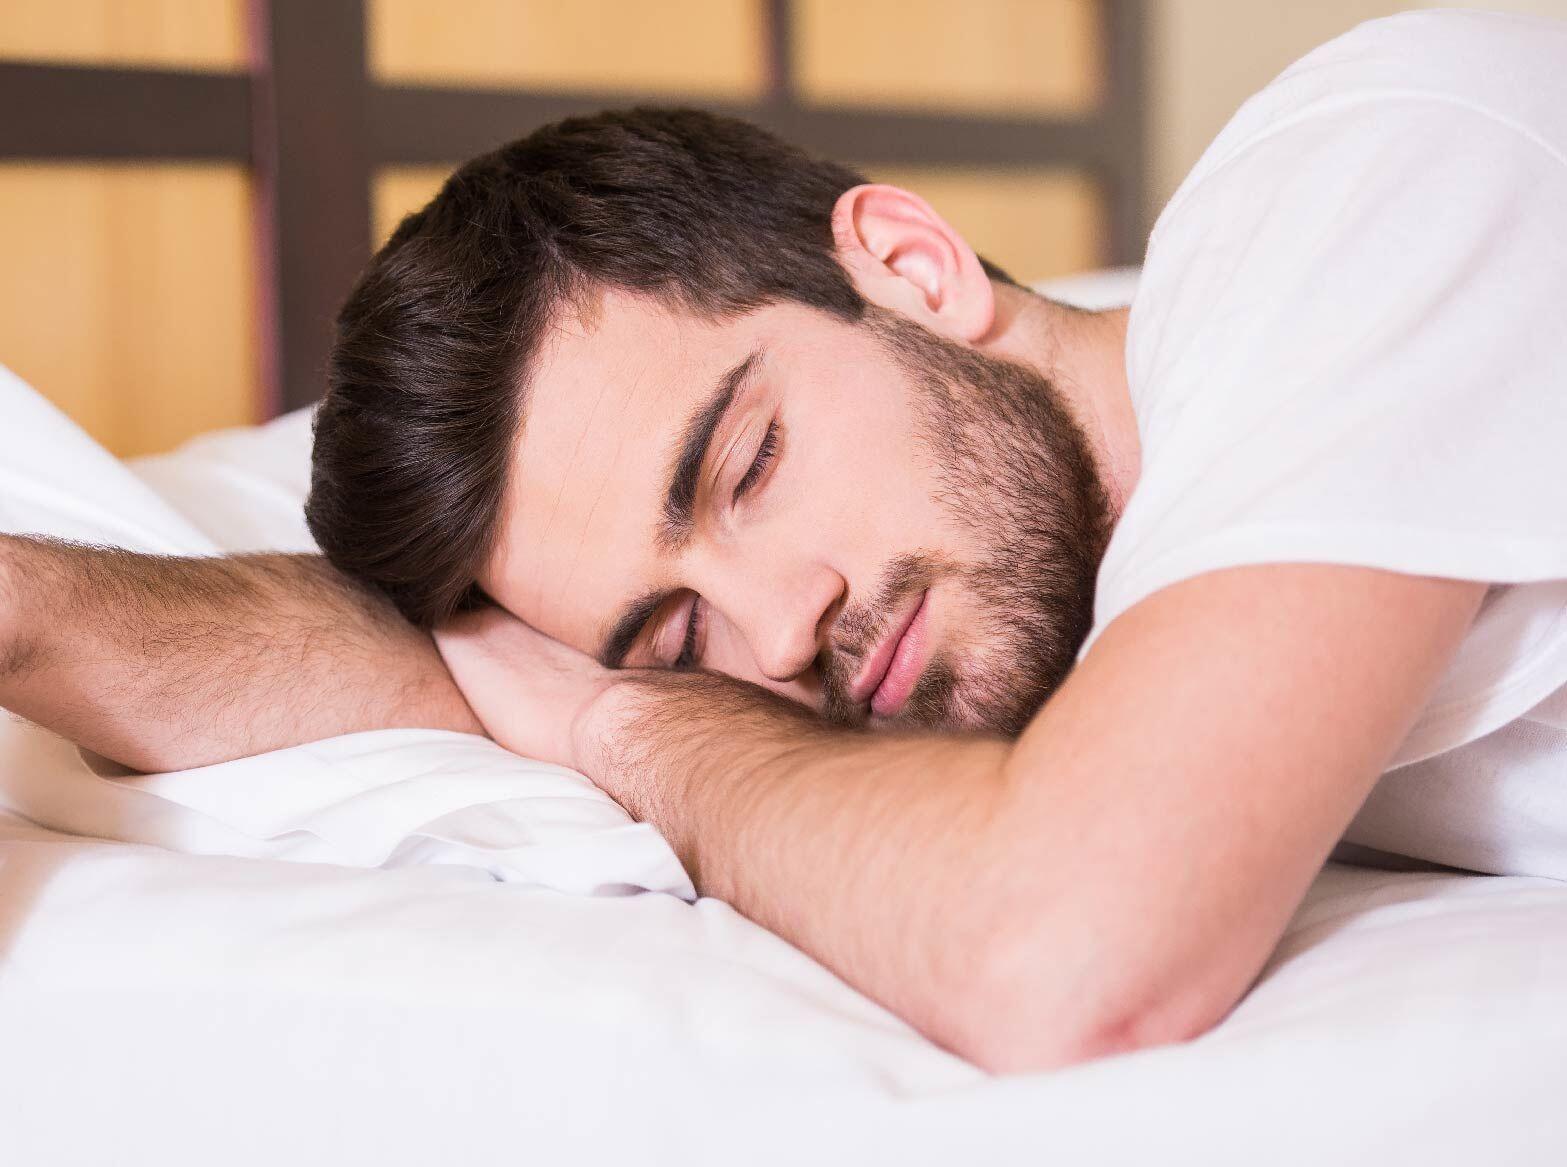 Jangan Tidur Tengkurap, Berikut Bahaya Kesehatan yang Akan Mengintaimu